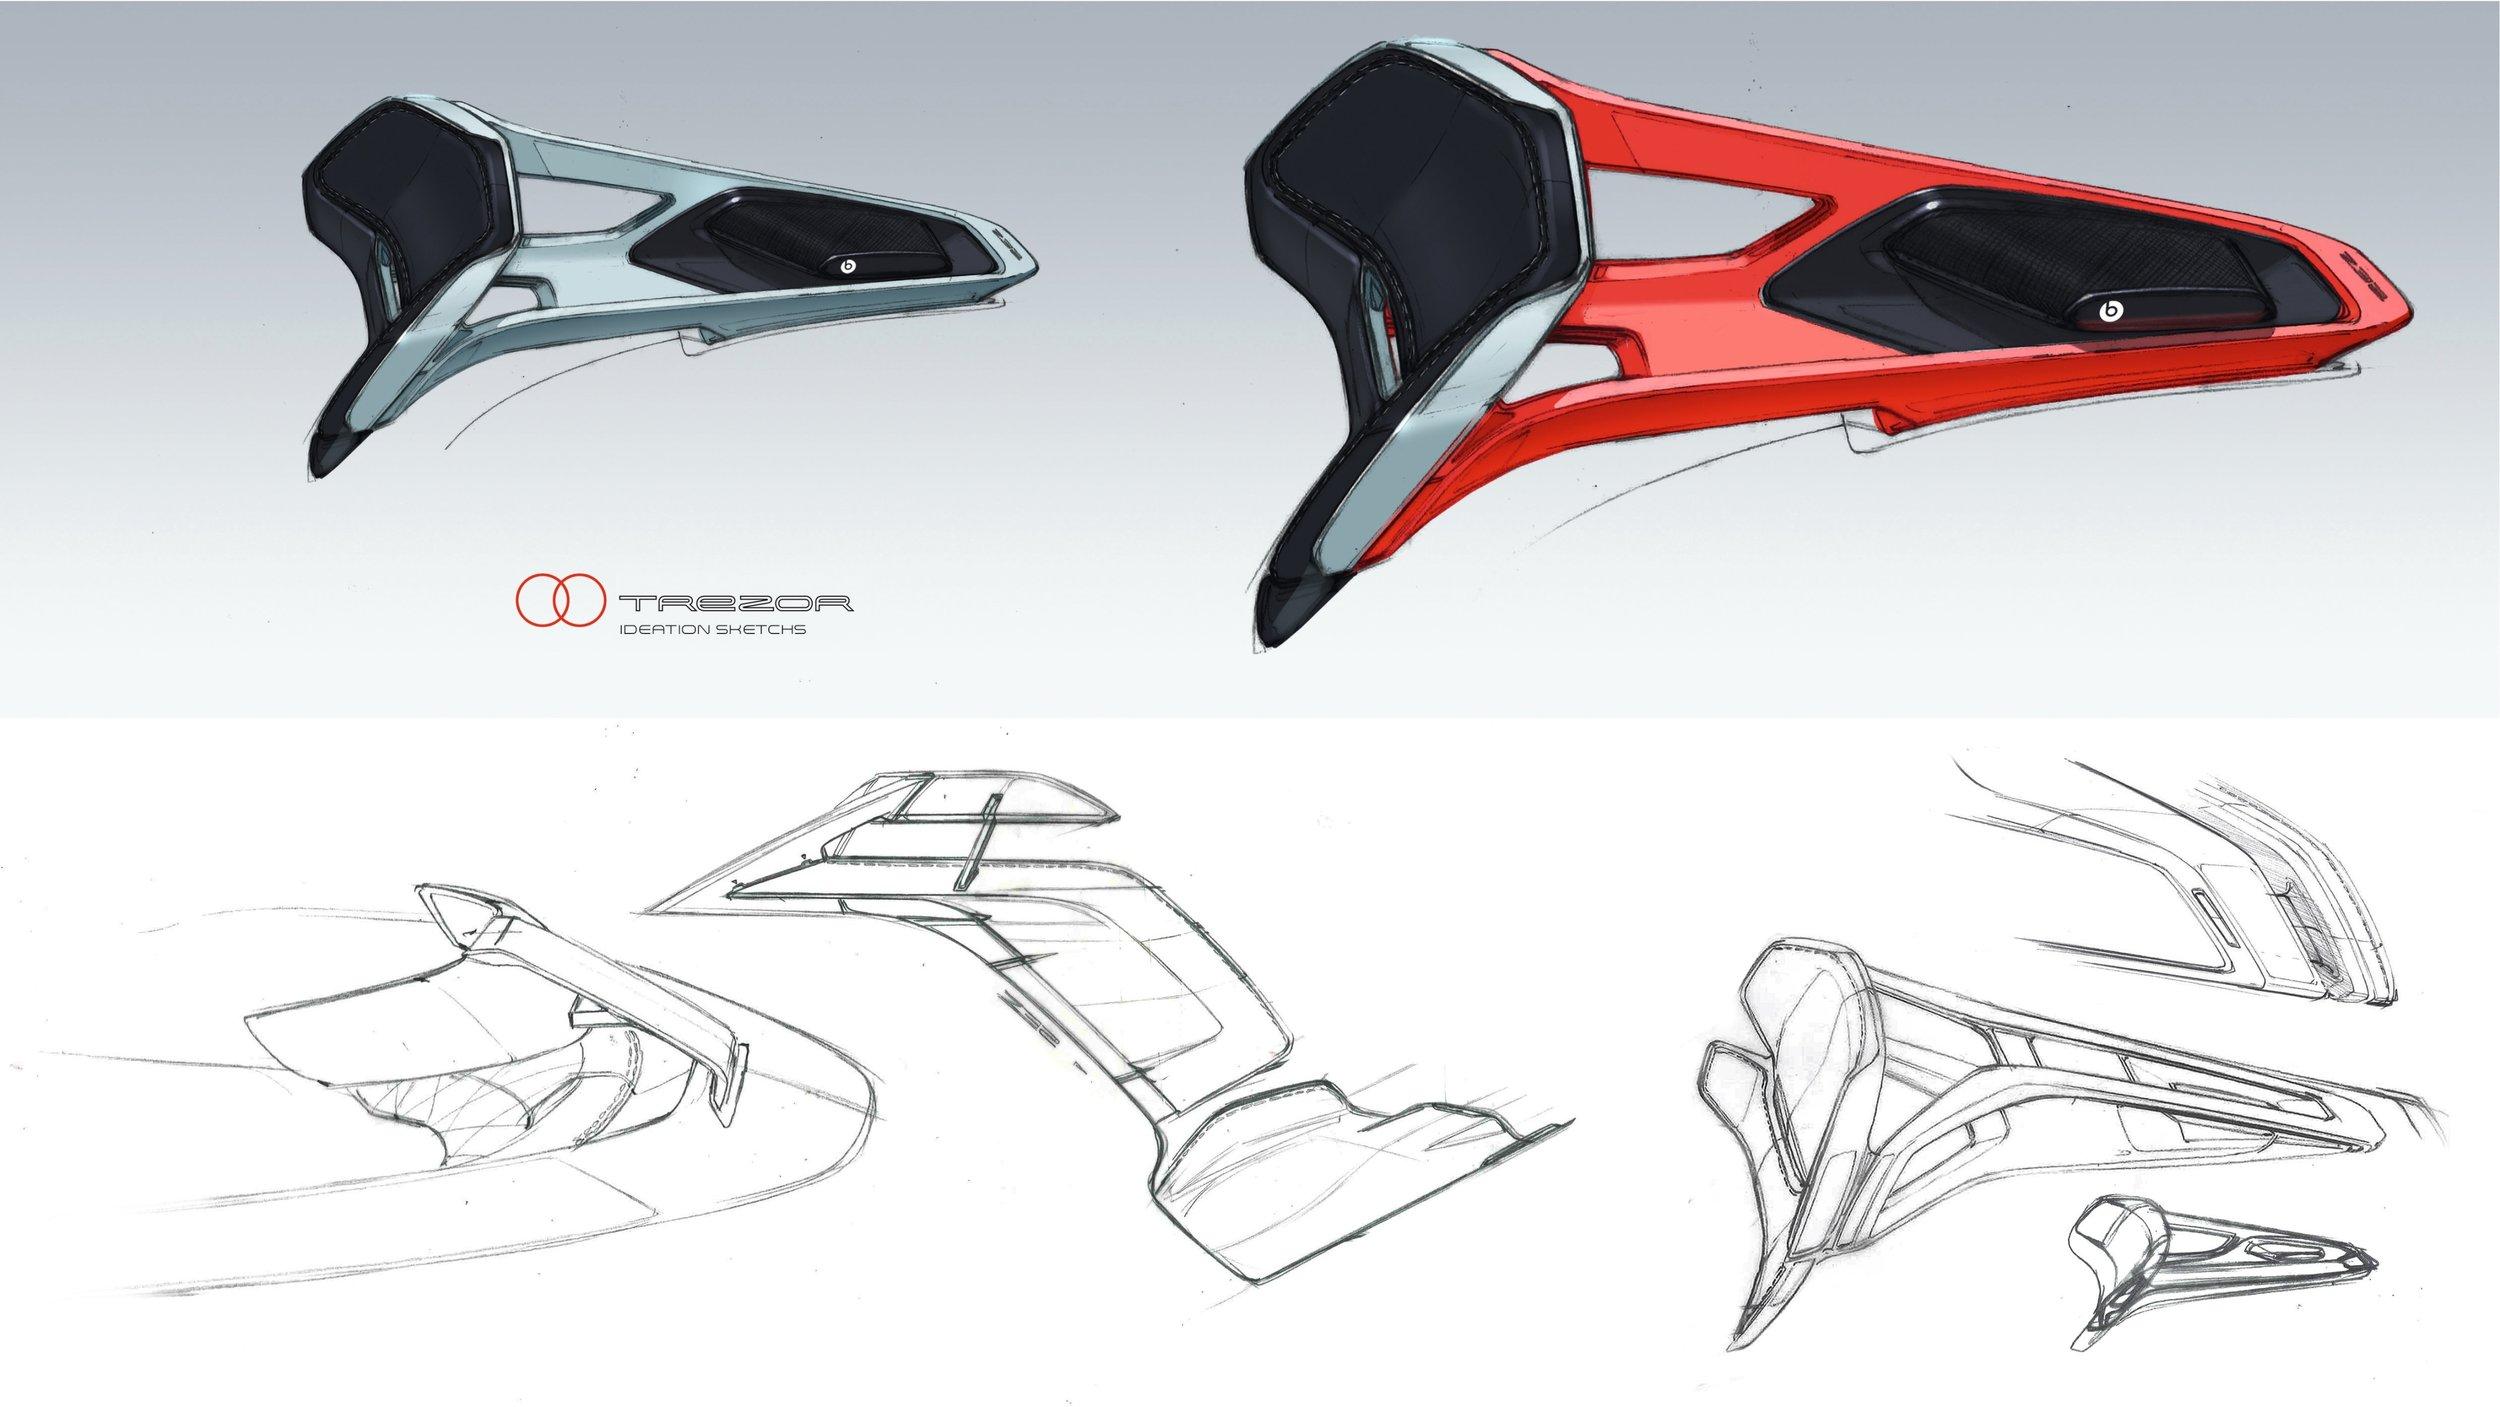 Trezor Concept Design - EMBARGO 08h15 UK Time 290916 (22).JPG